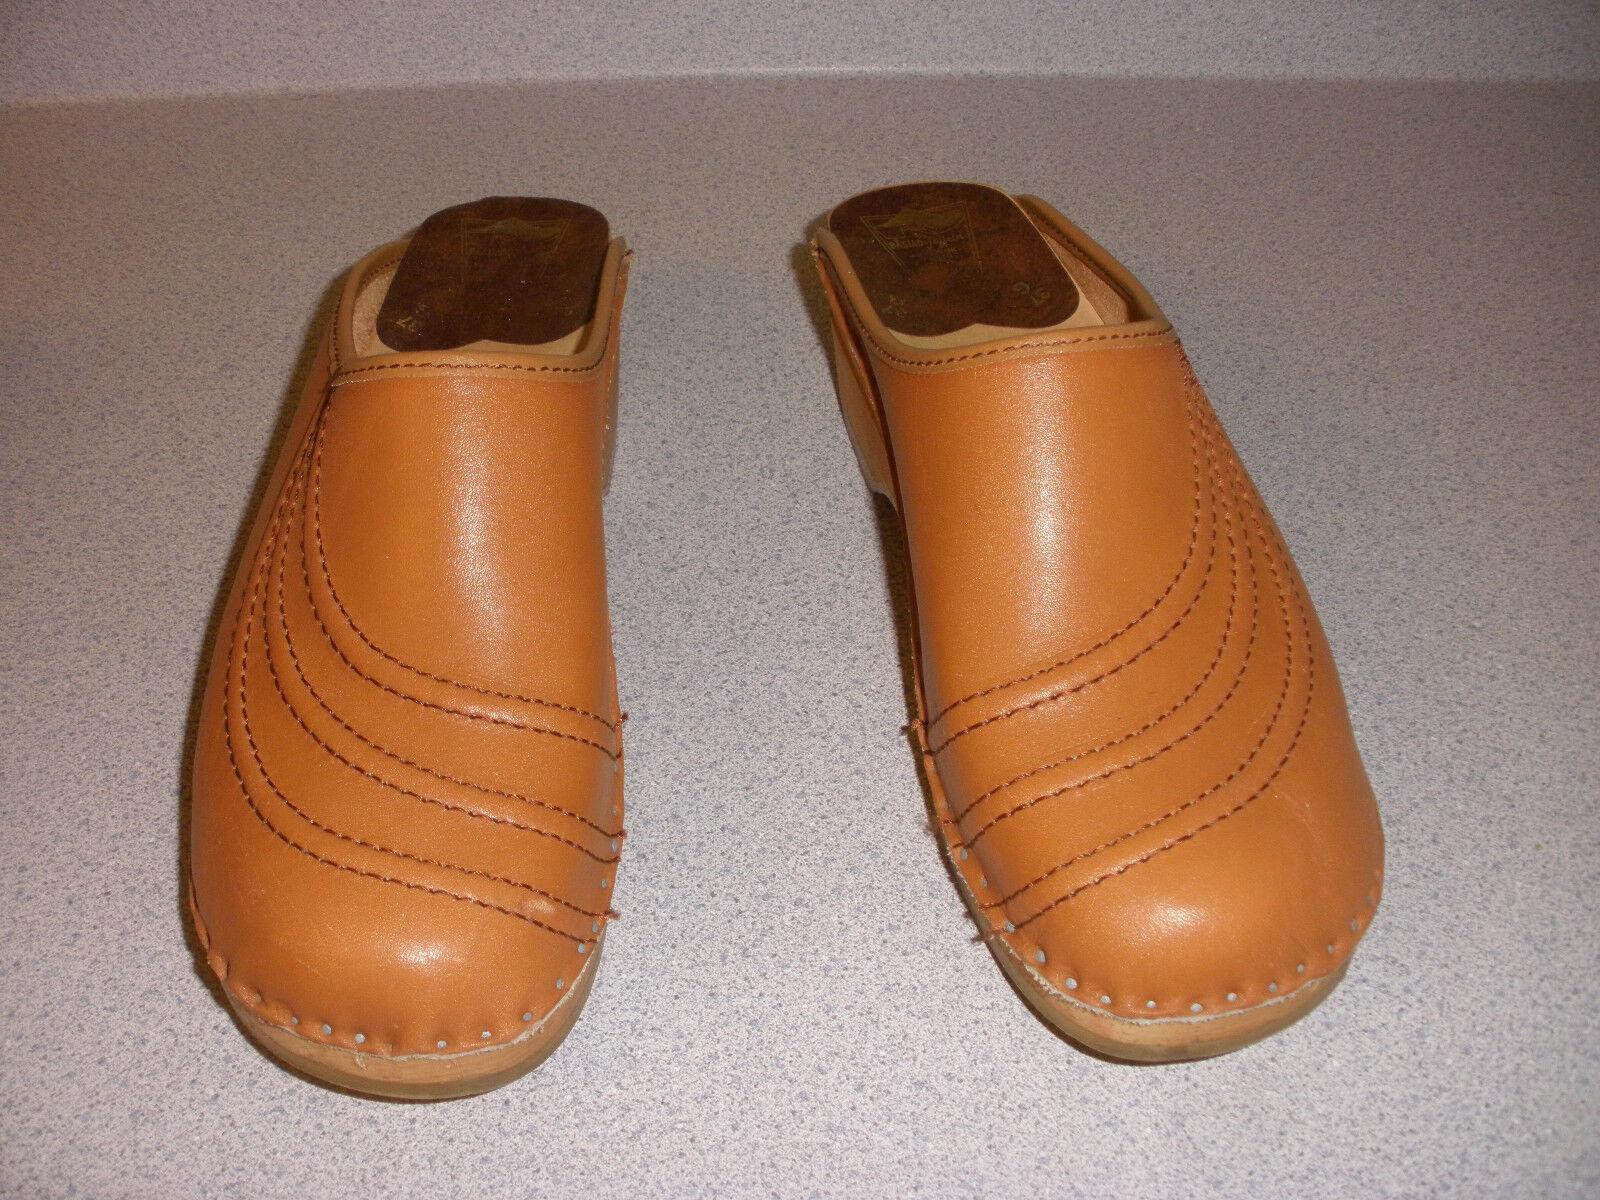 Bastad-joffeln Mujer Zapatos Zuecos sueco 37G 37G 37G 6.5 tan  calidad garantizada